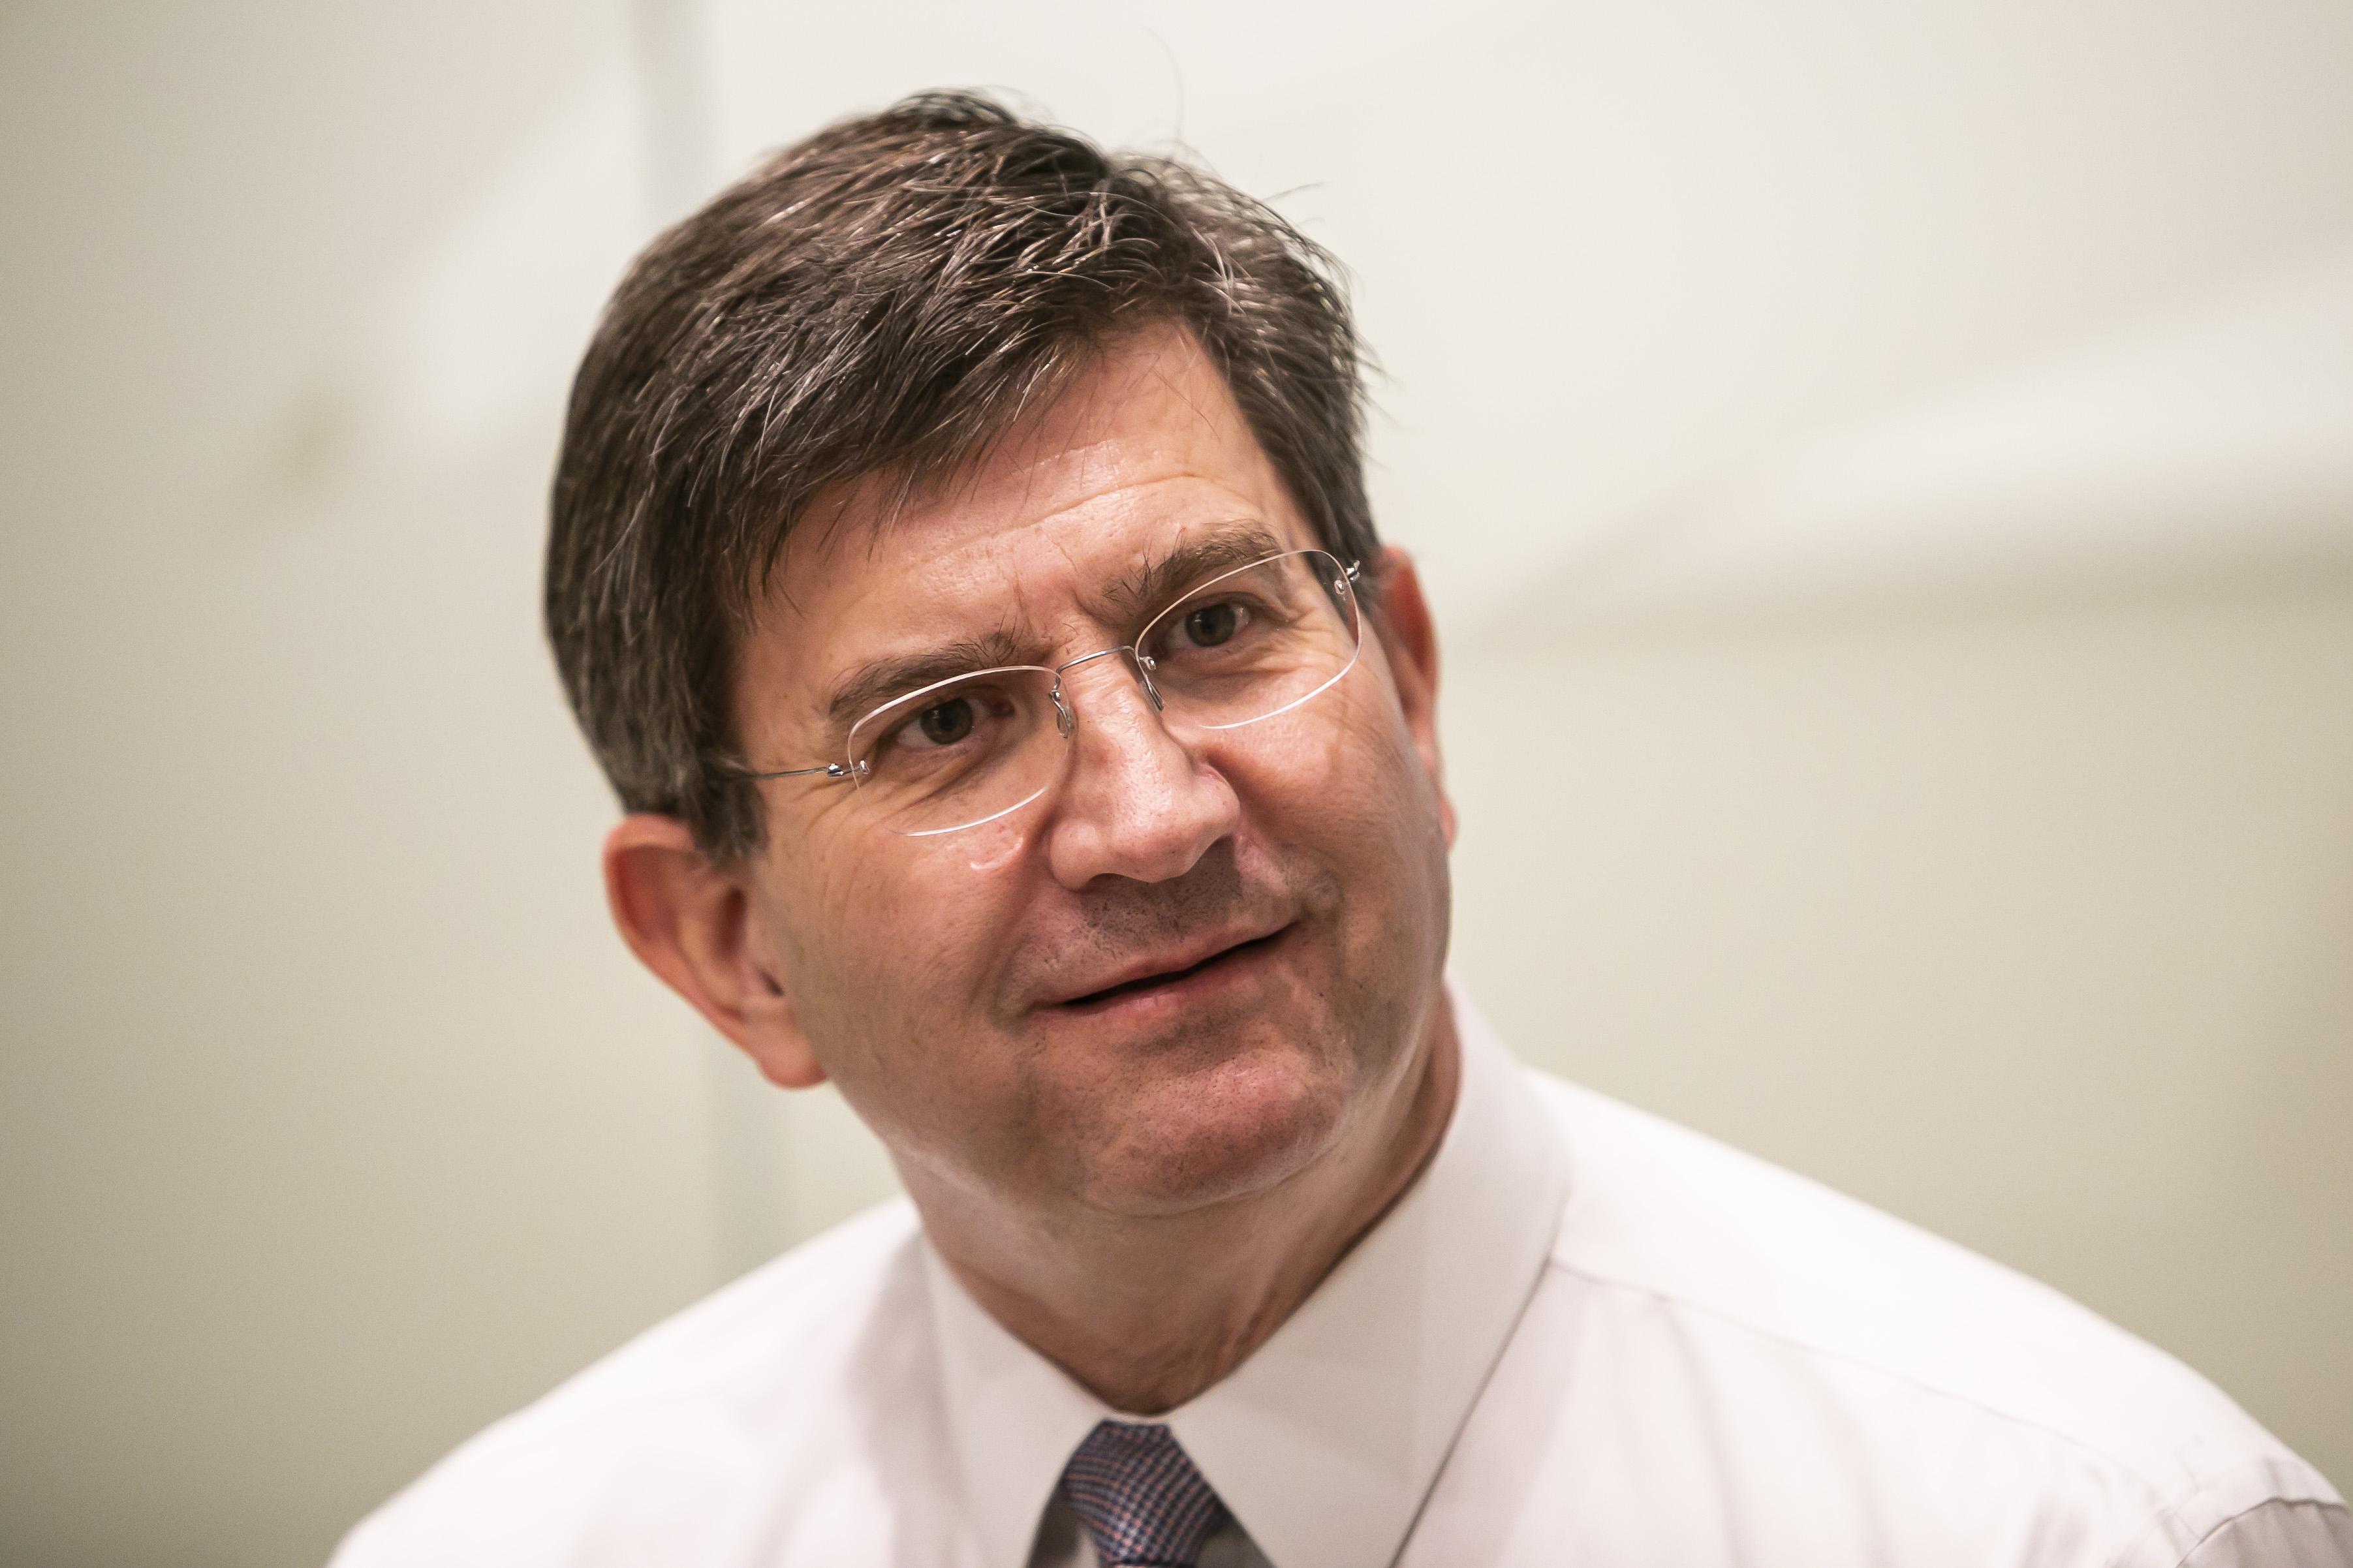 Brad Schneider, 10th Congressional District Democratic nominee and incumbent, 2020 election